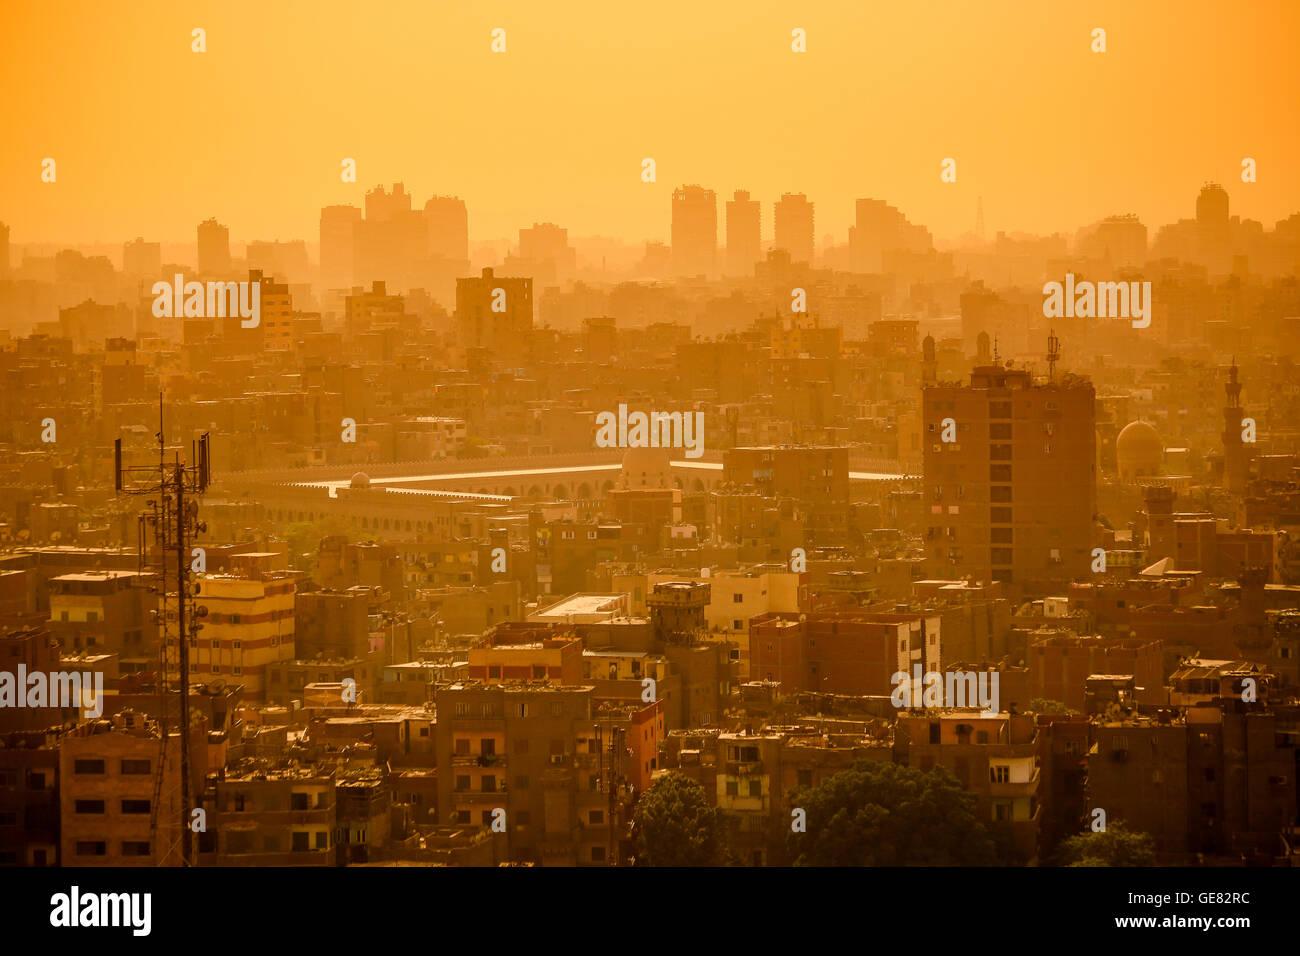 Cairo cityscape, Egypt - Stock Image